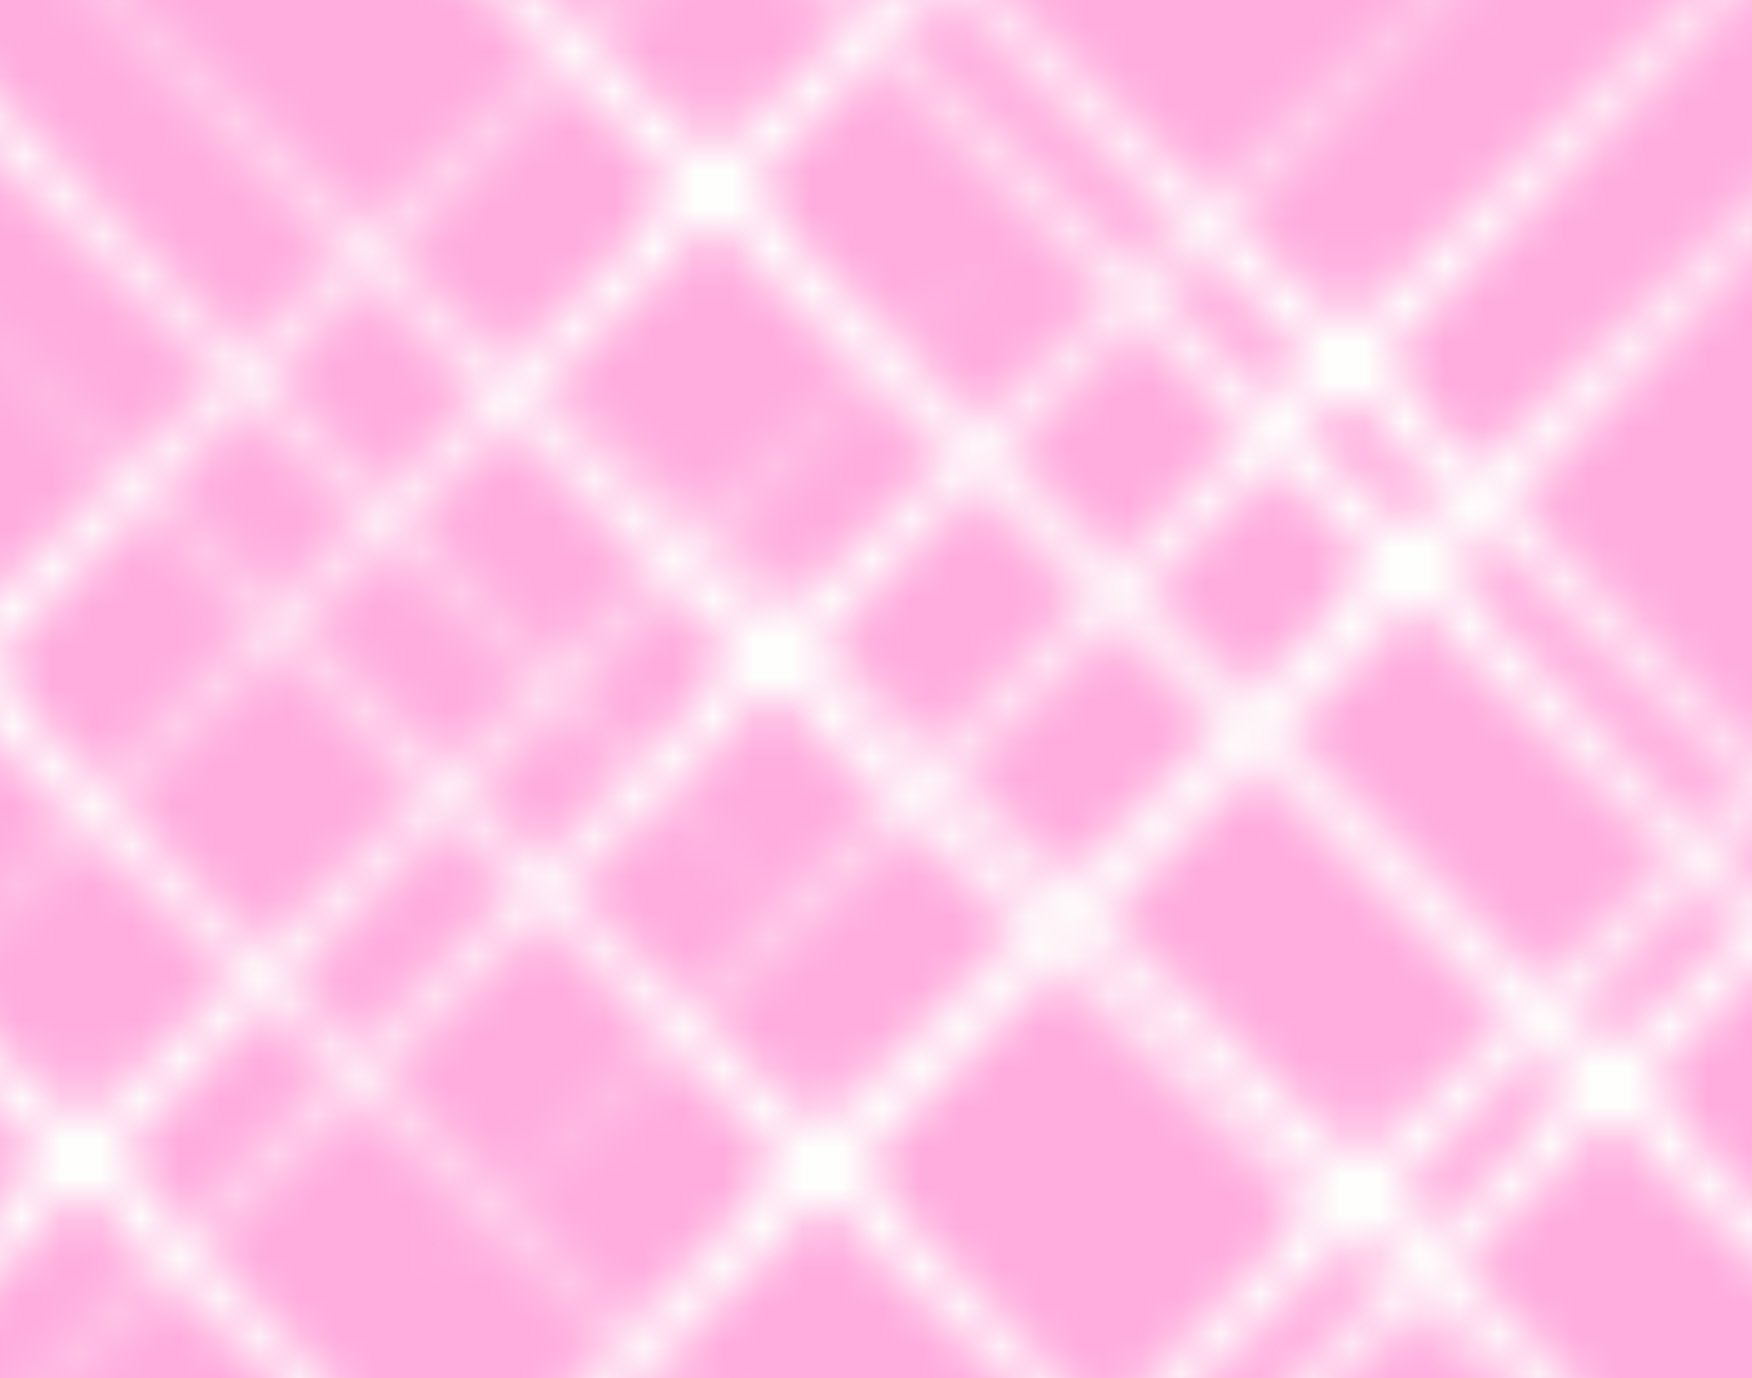 pink and white backgrounds wallpapersafari zebra print vector art zebra print vector free download